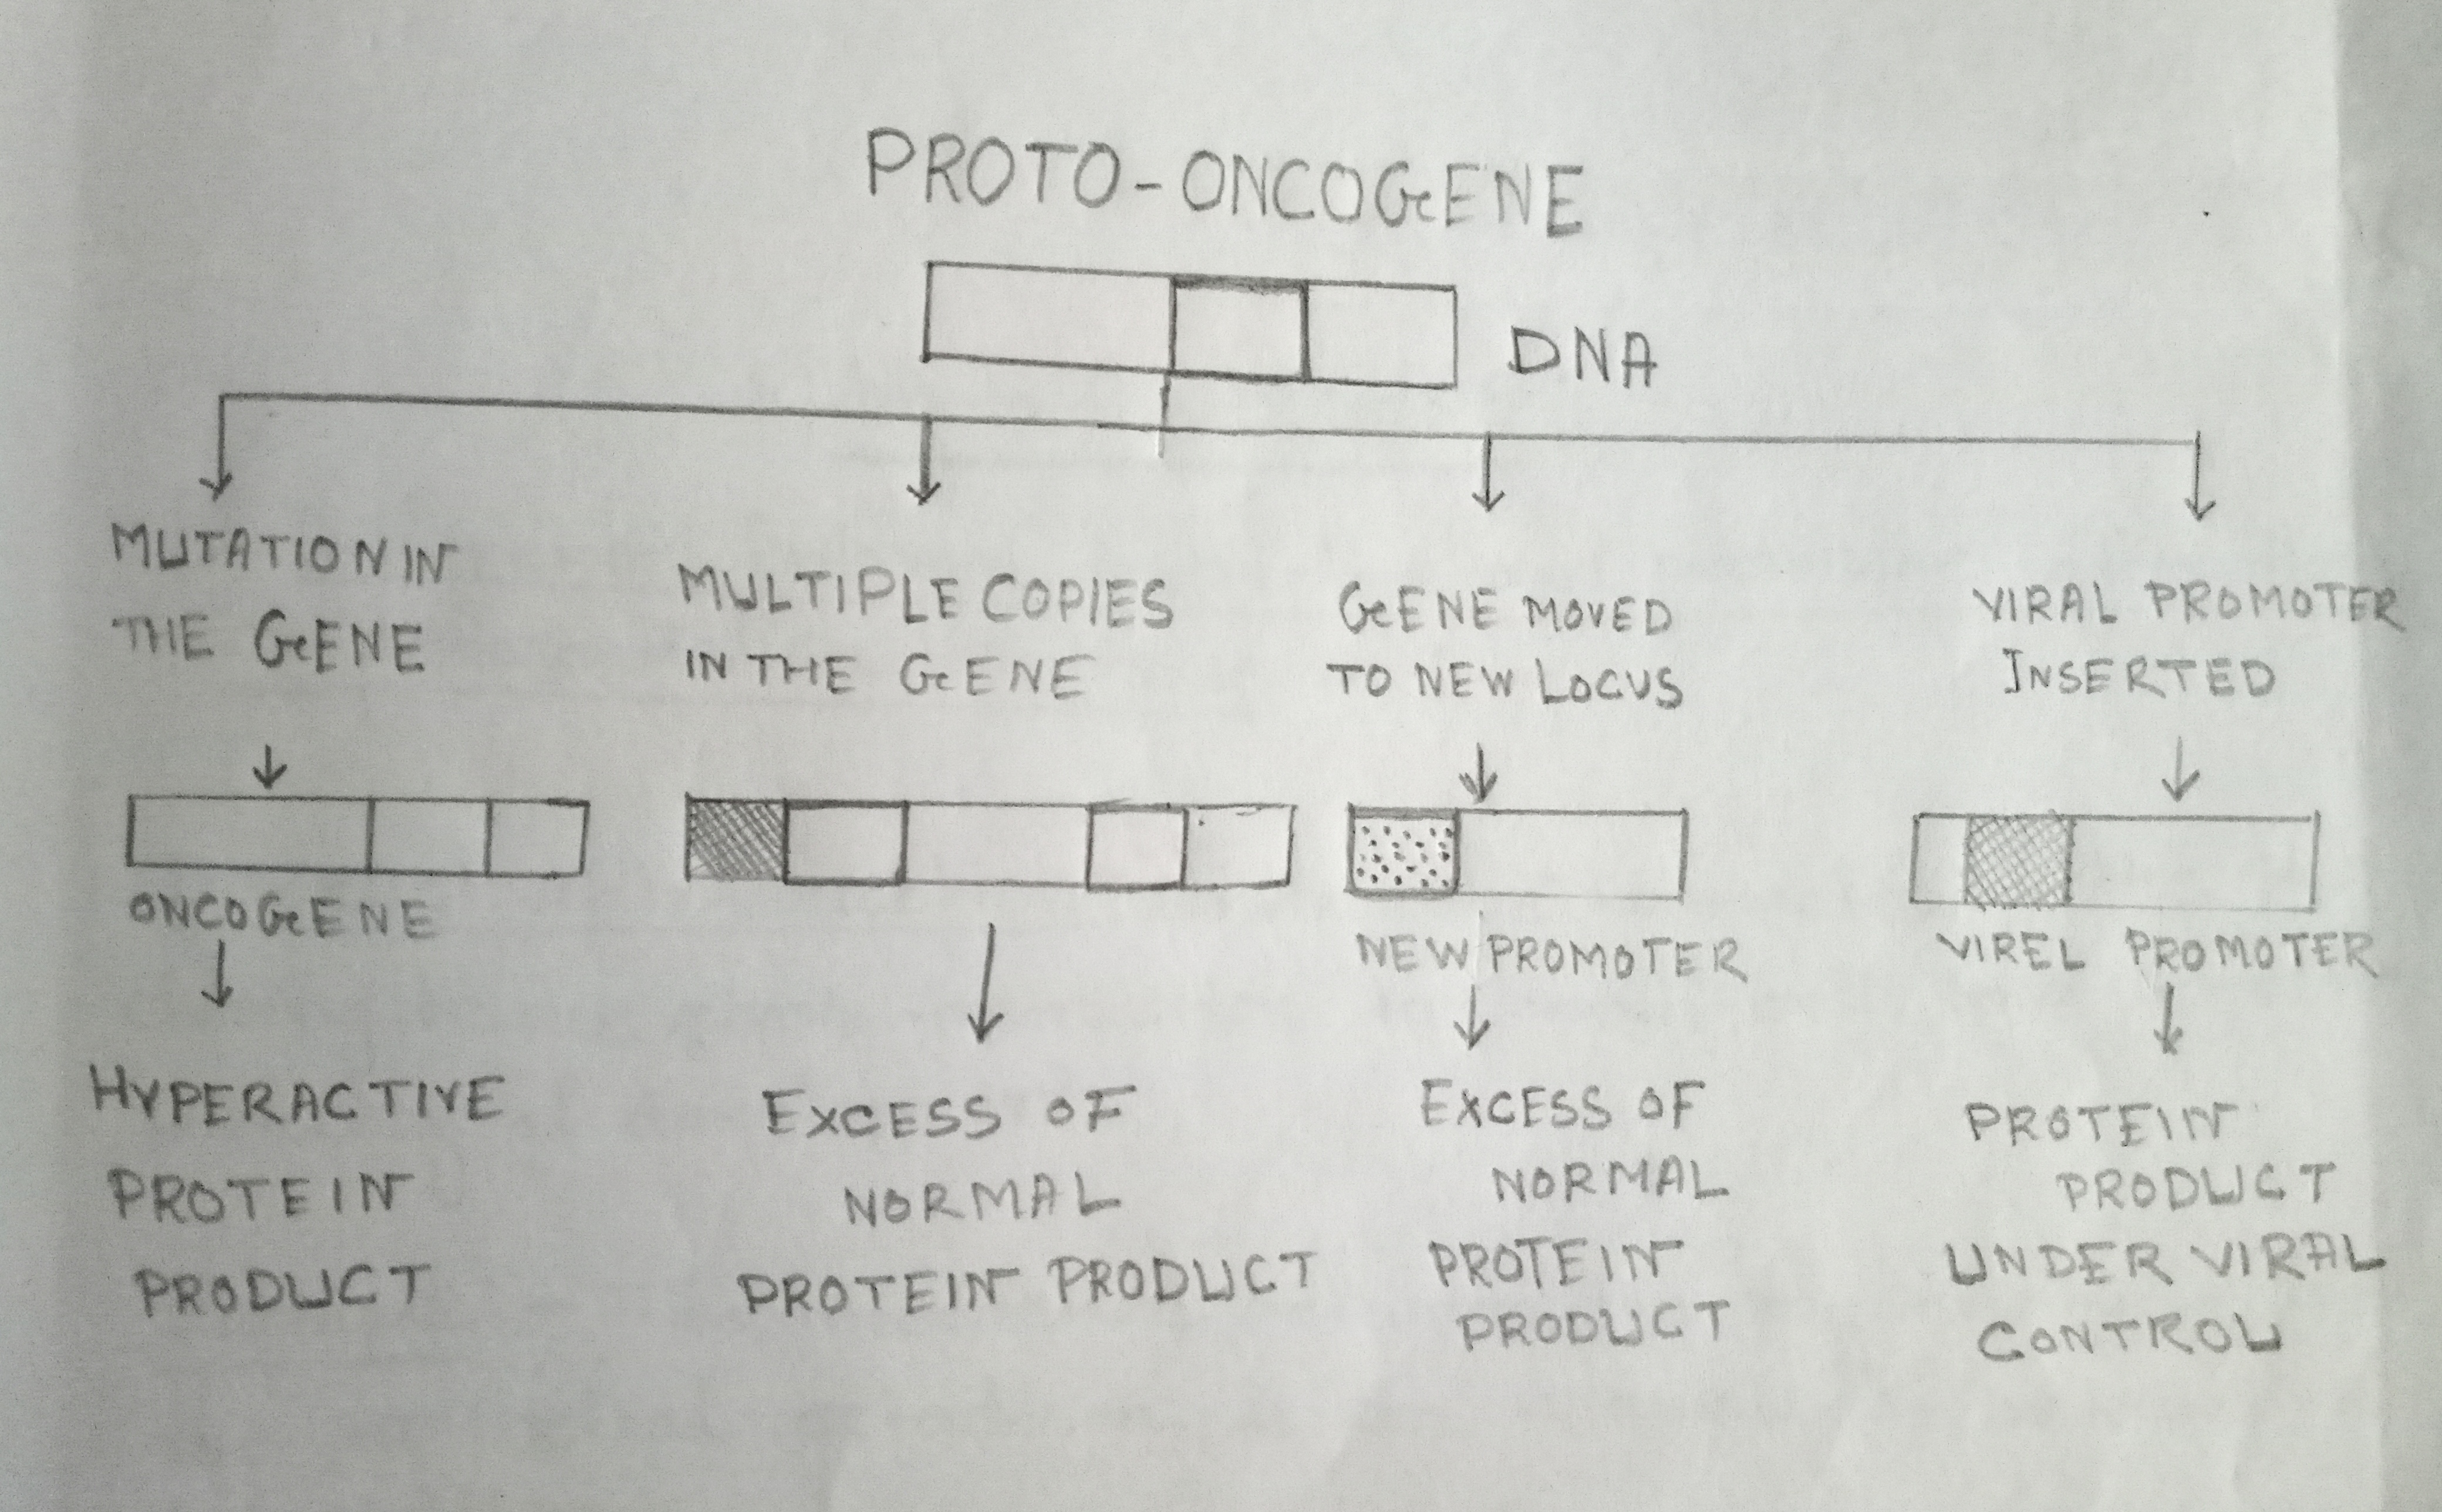 Alternate ways of converting Proto-oncogenes to oncogenes